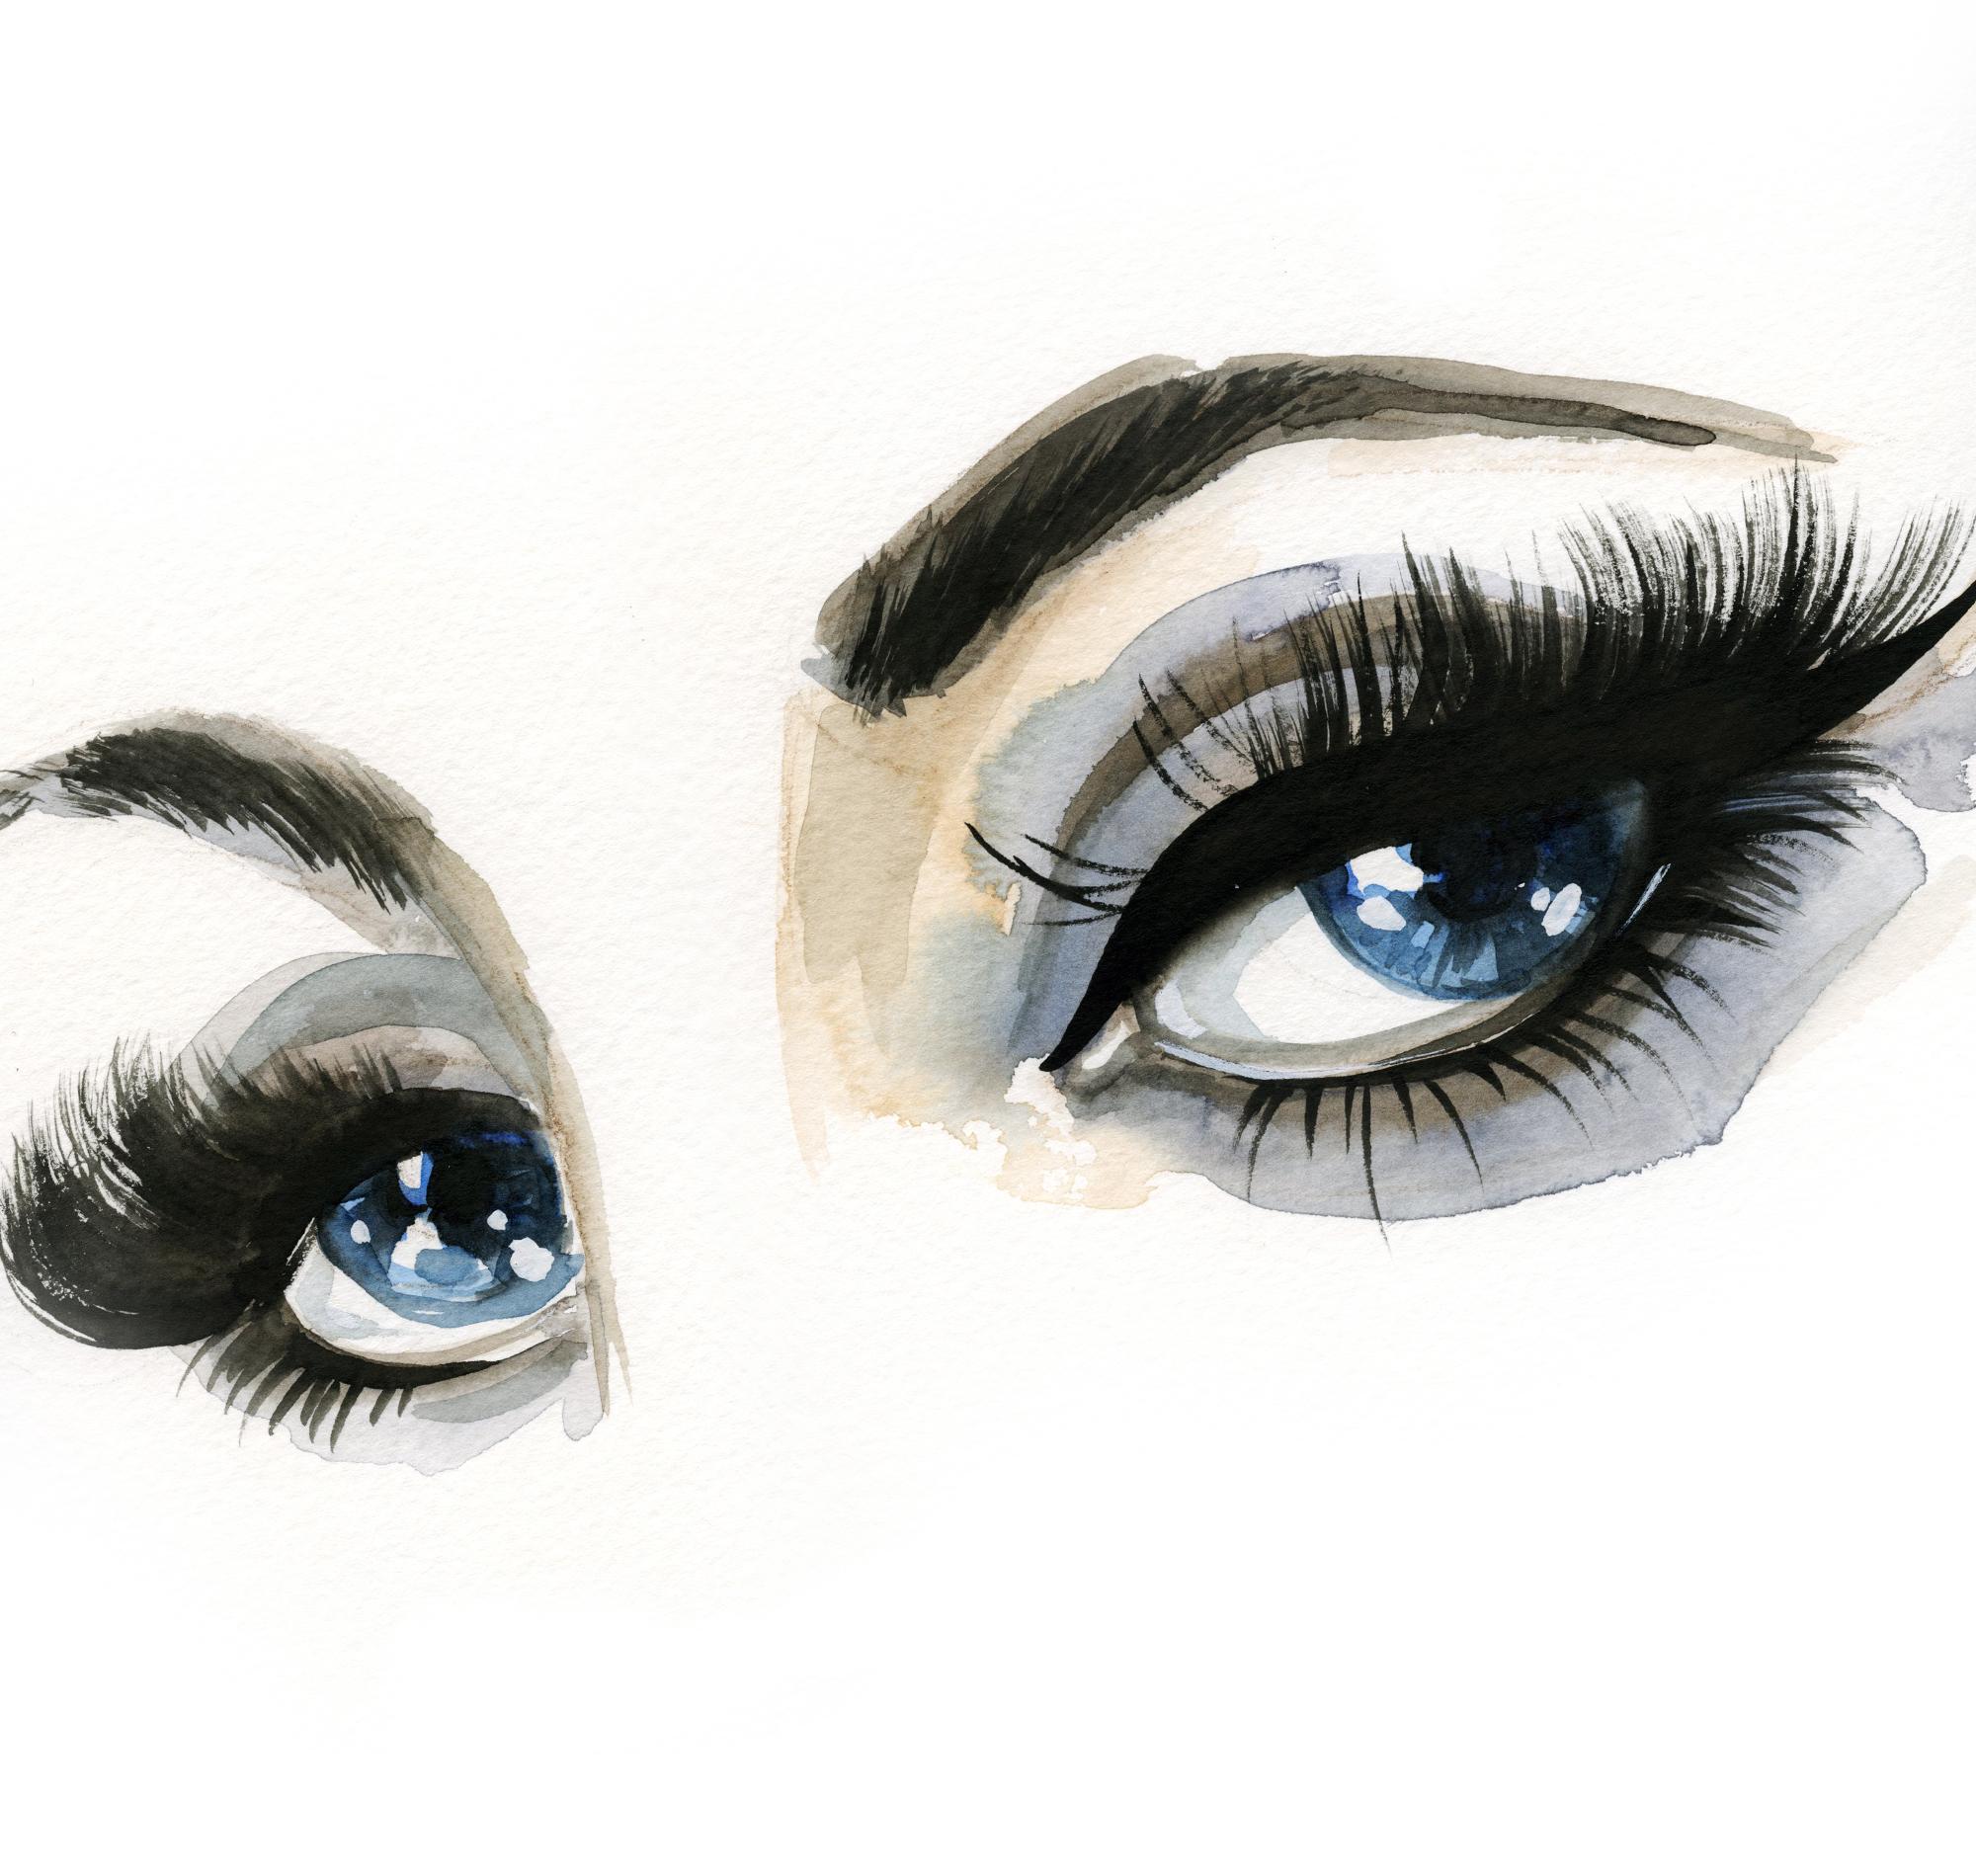 2000x1899 Ice Blue Eyes Luda Stekol